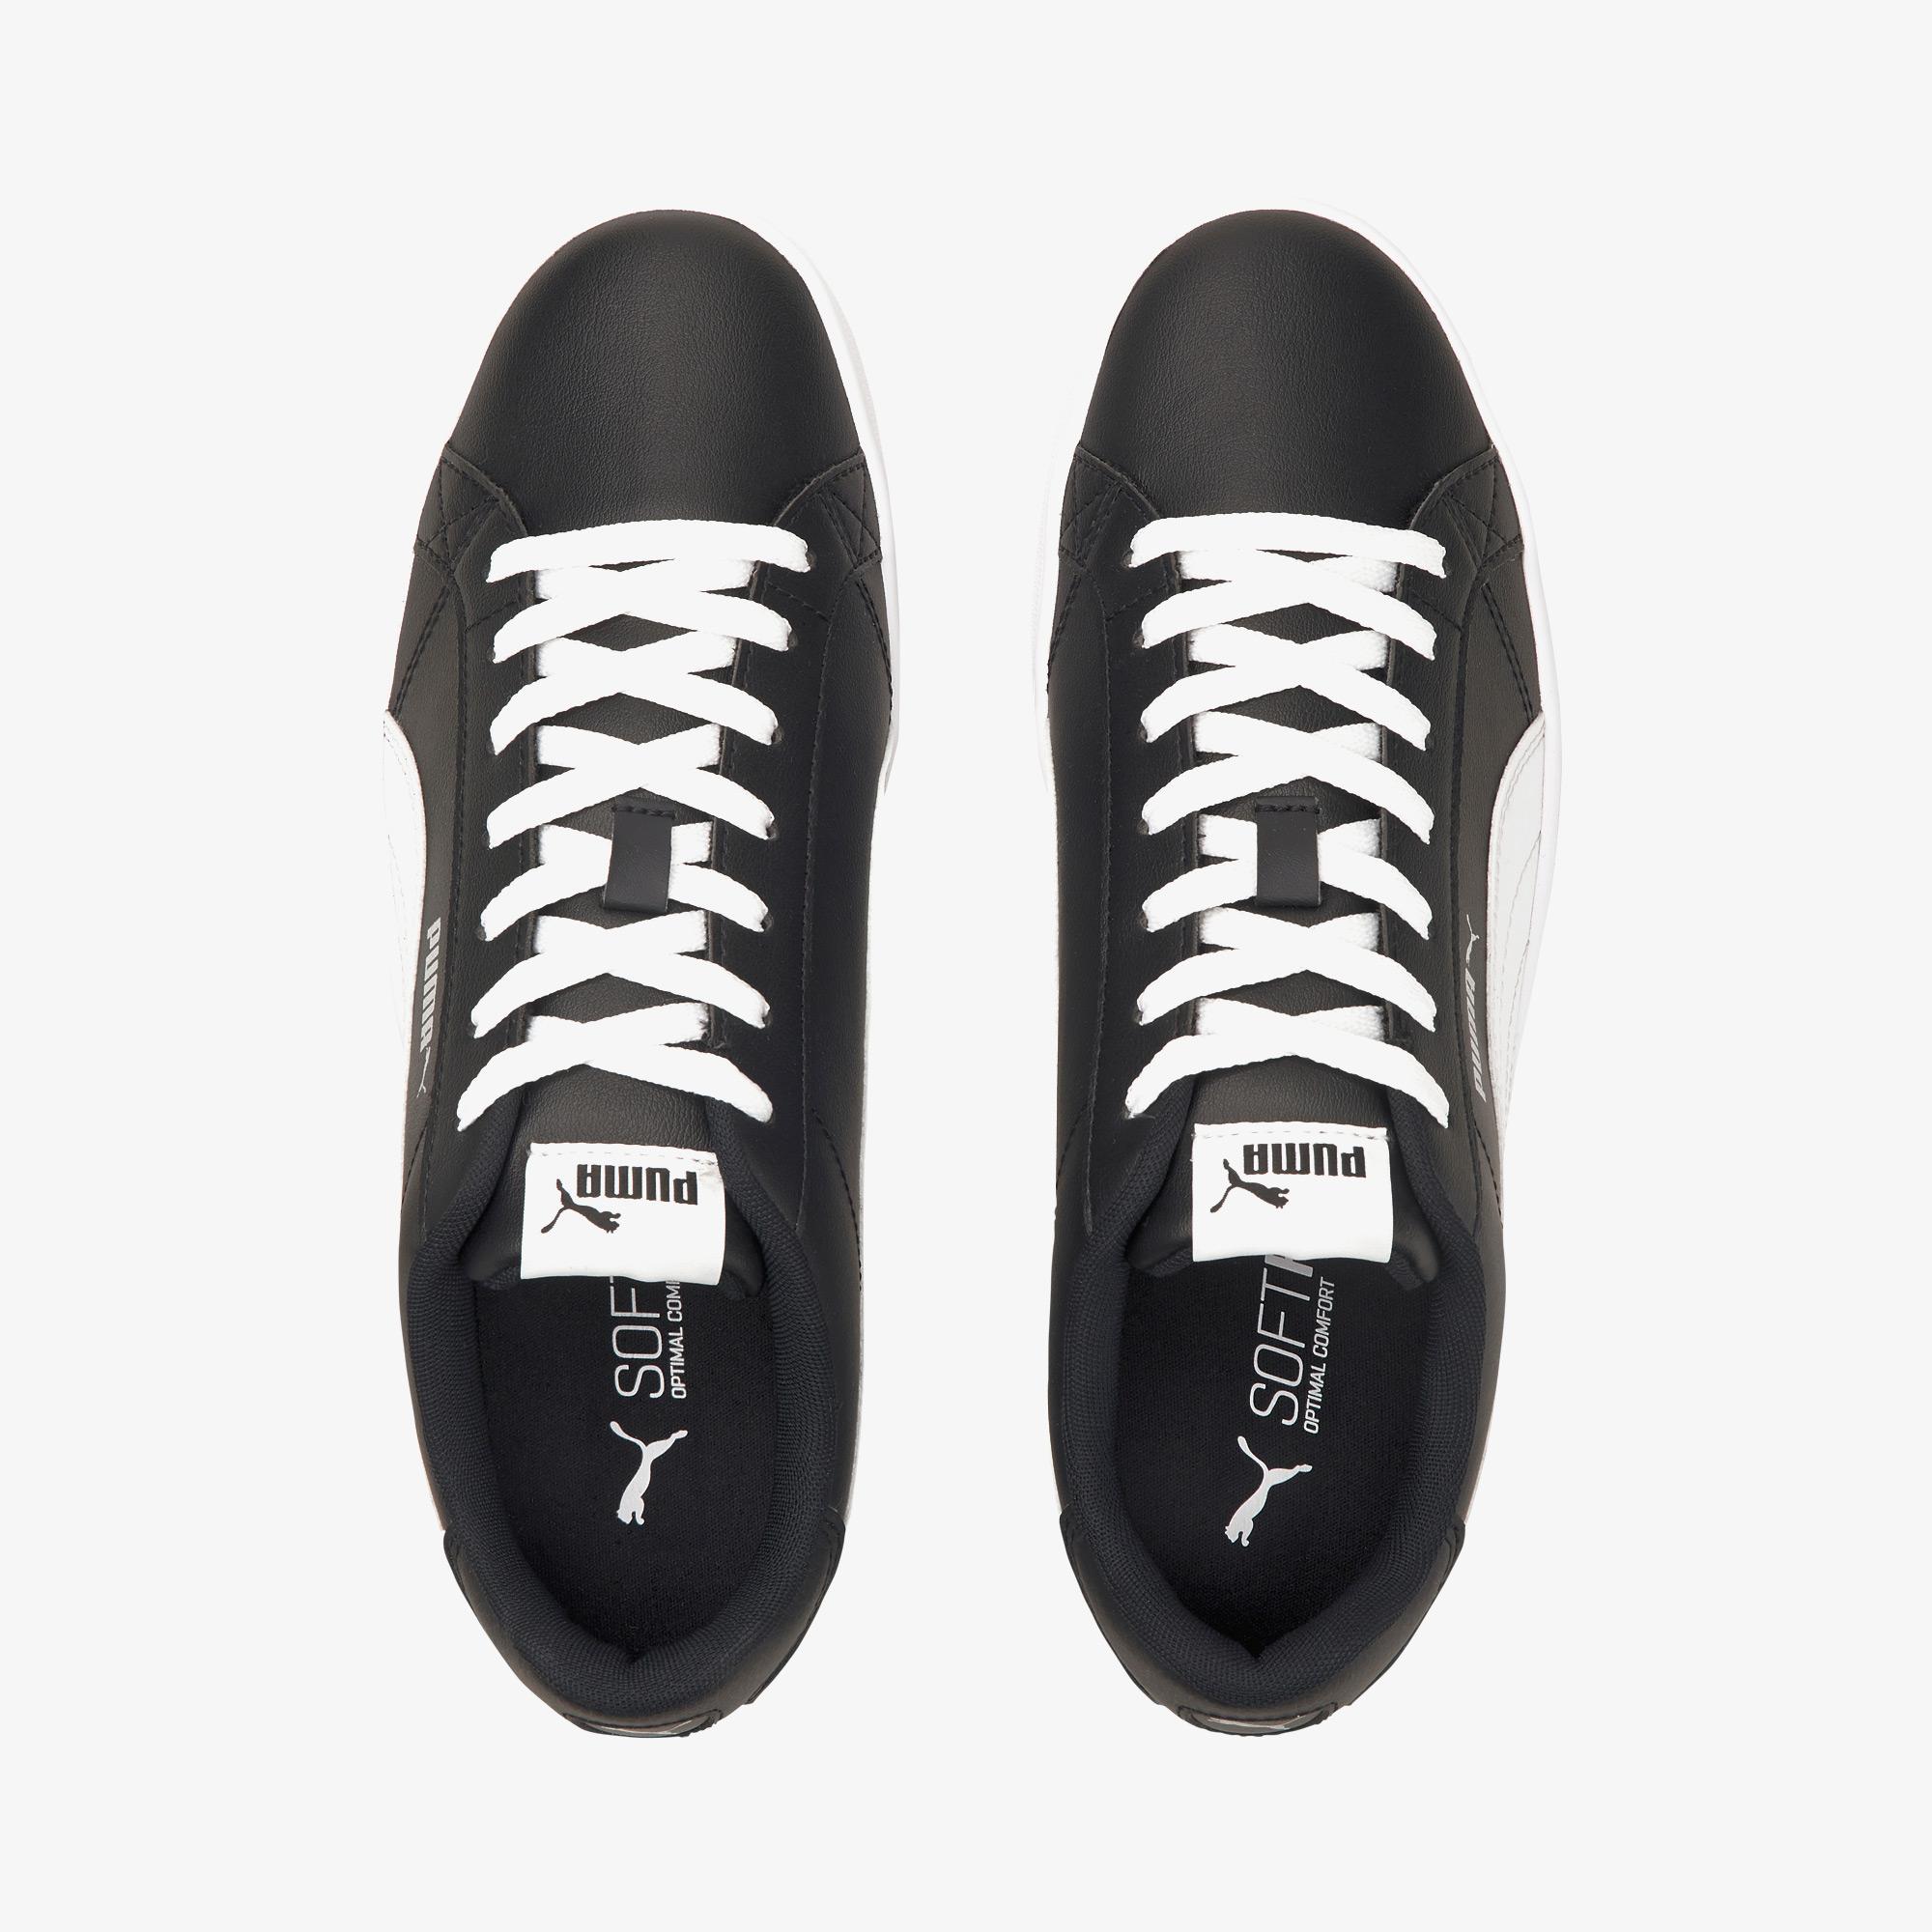 Puma Smash Vulc V3 Kadın Siyah Spor Ayakkabı